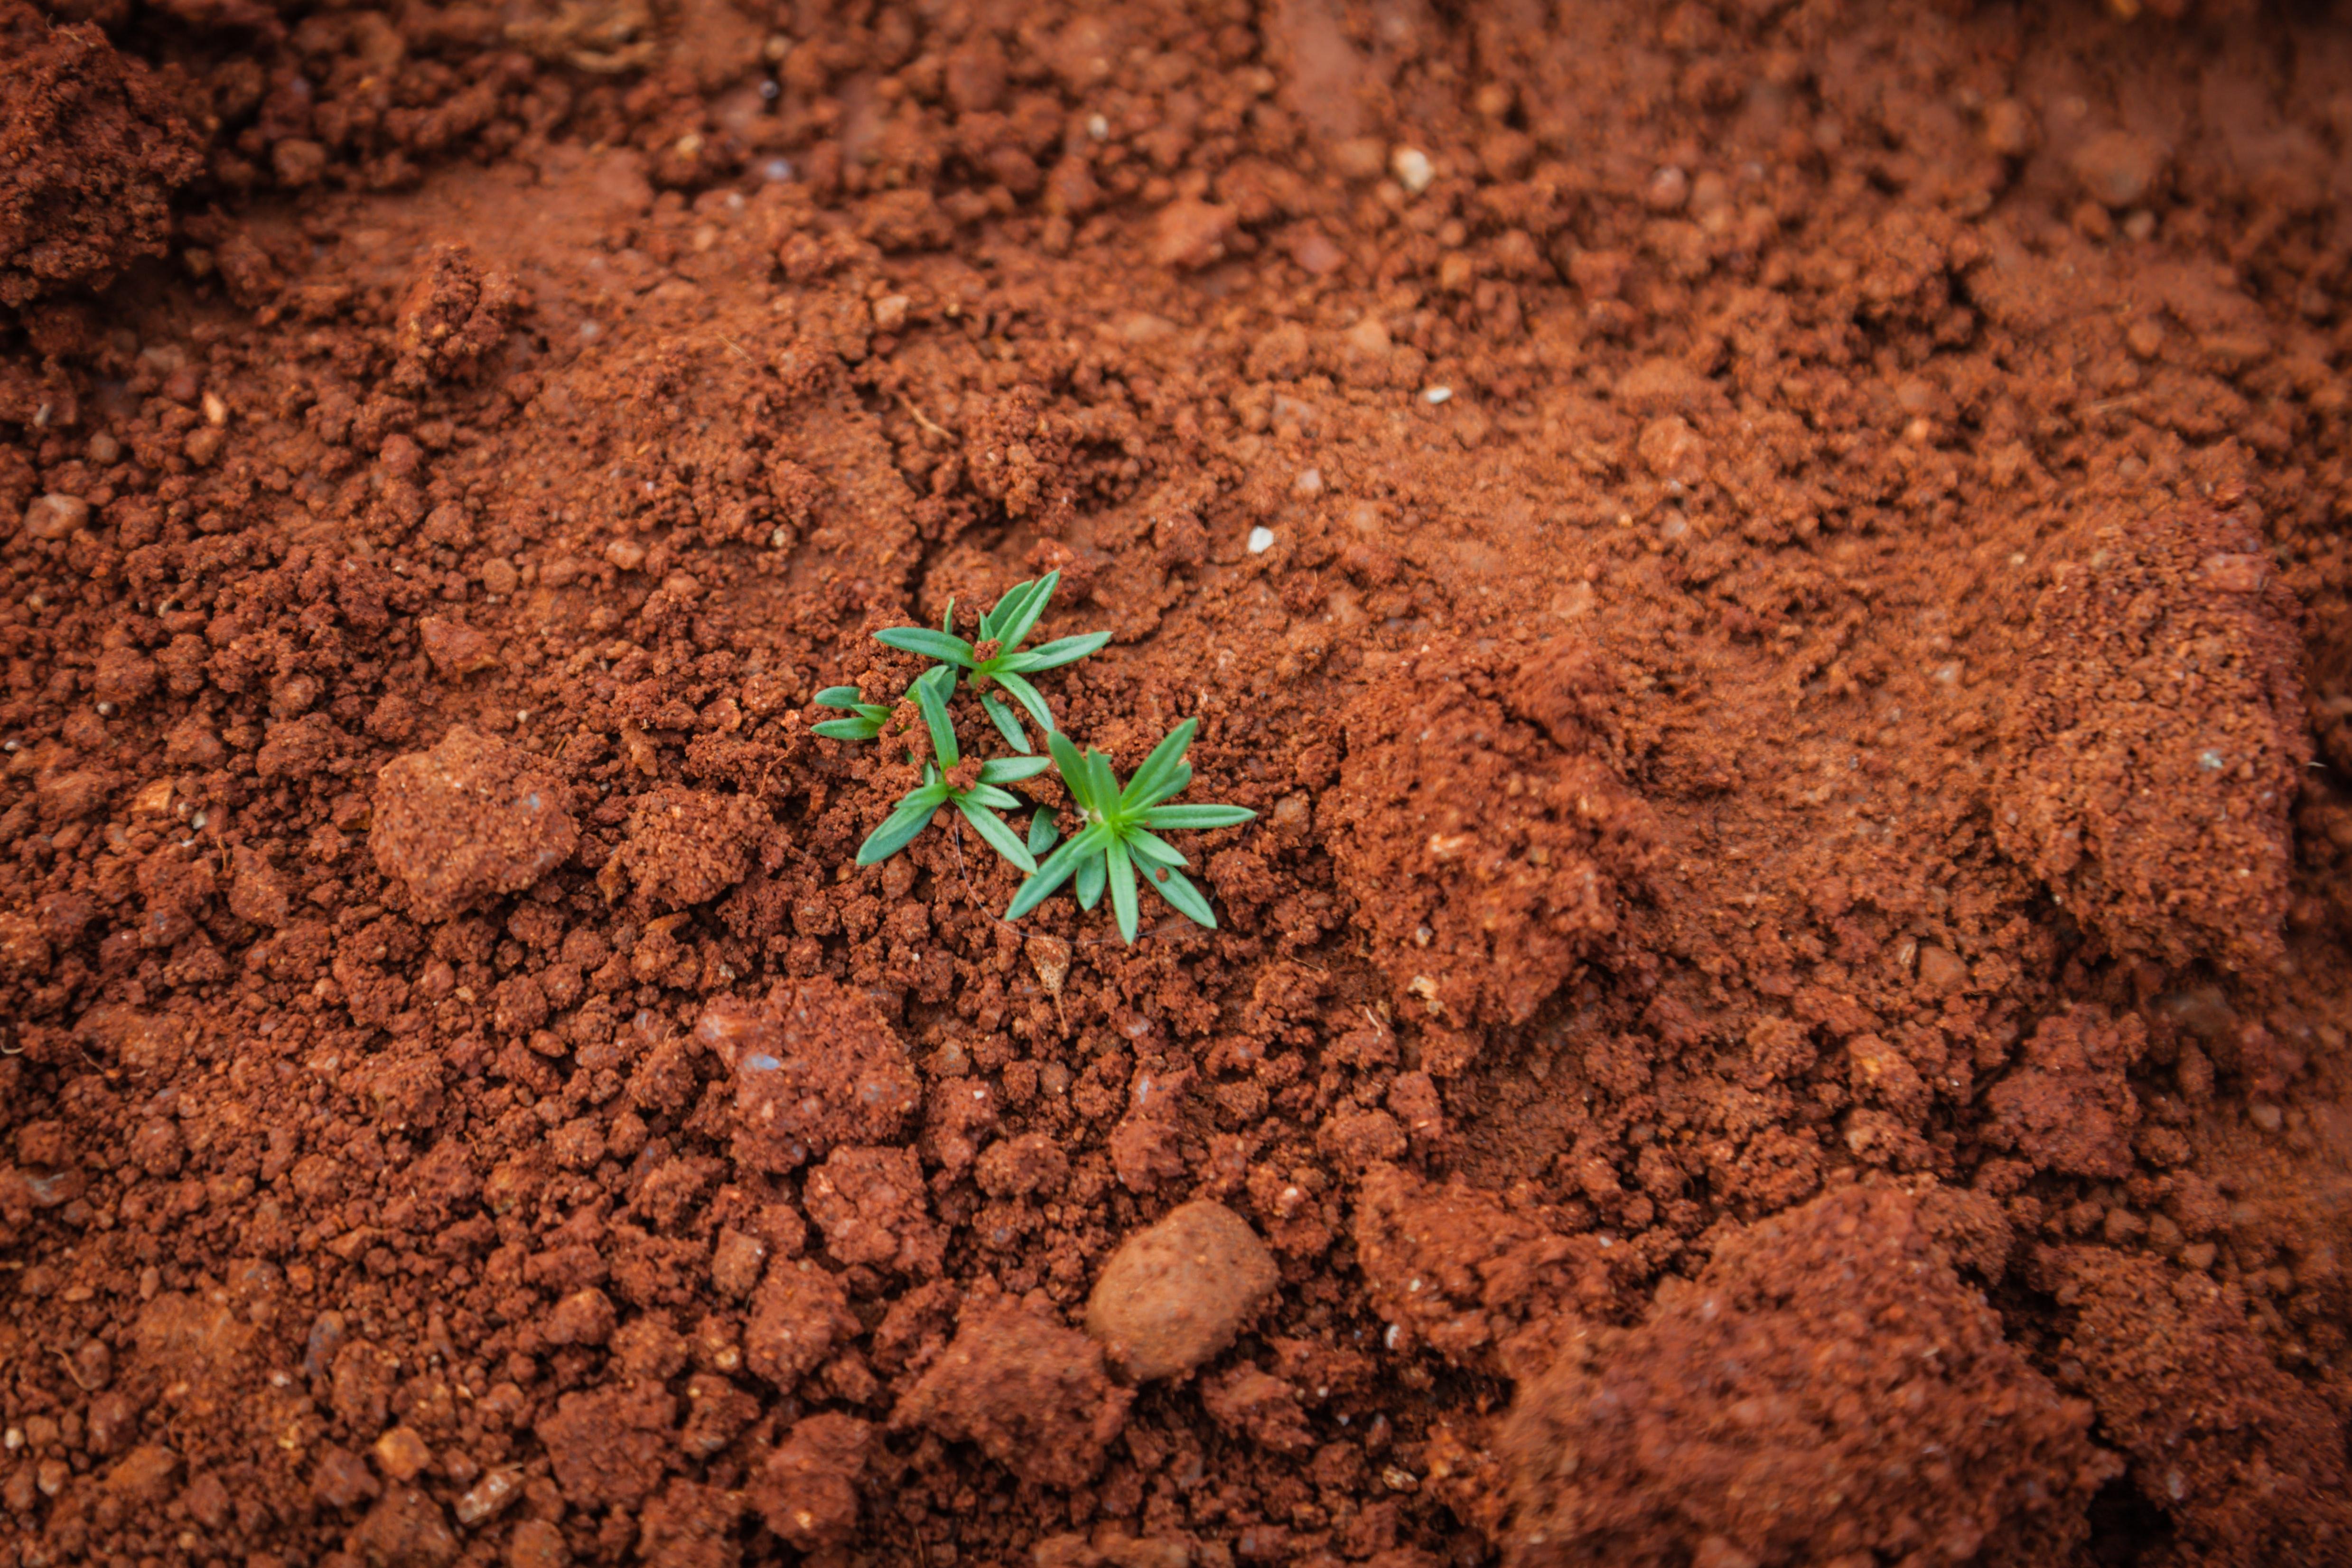 plan in soil